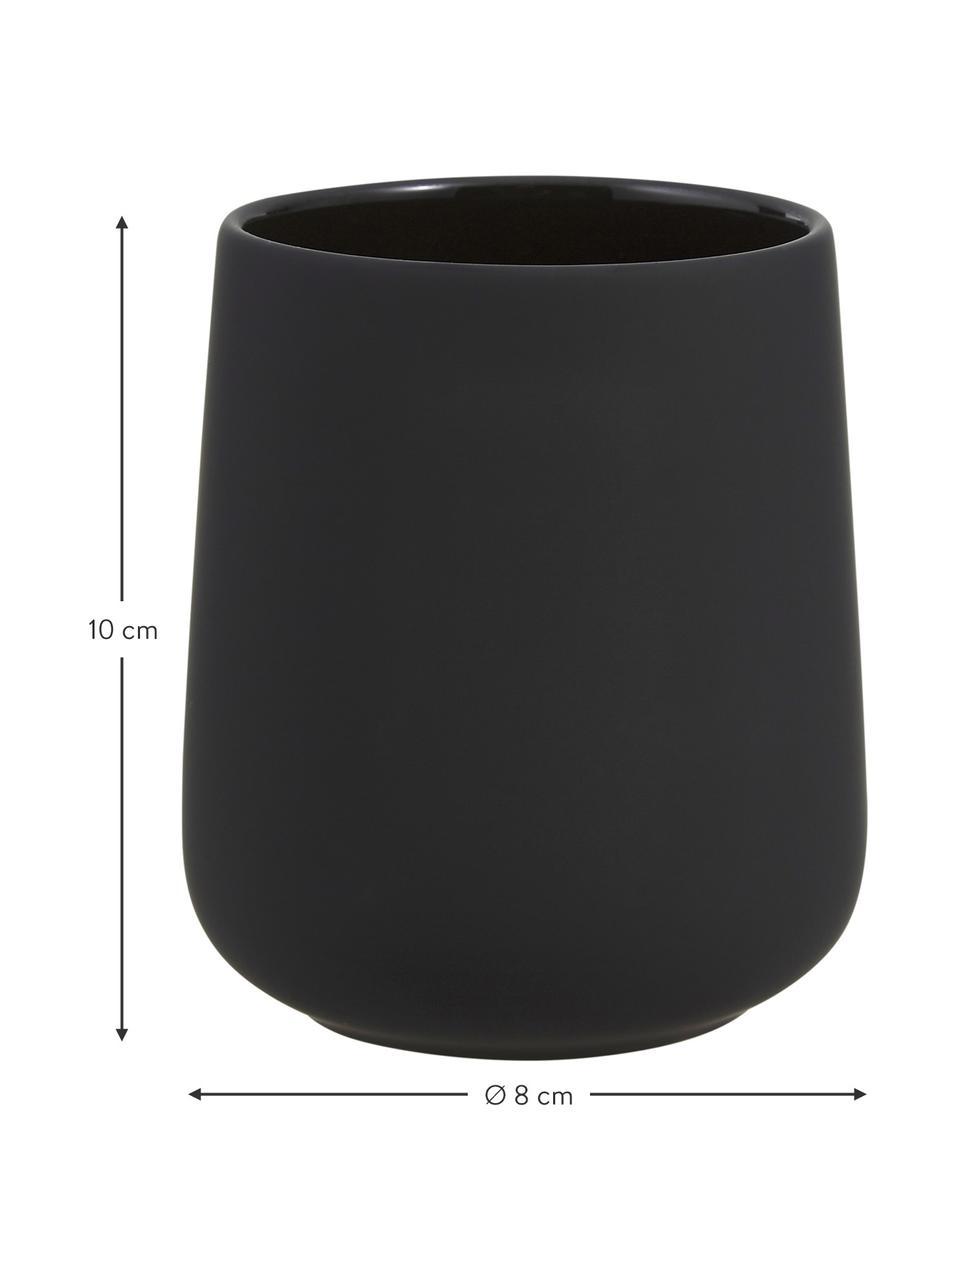 Porta spazzolini in porcellana Clean, Porcellana, Nero, Ø 8 x Alt. 10 cm